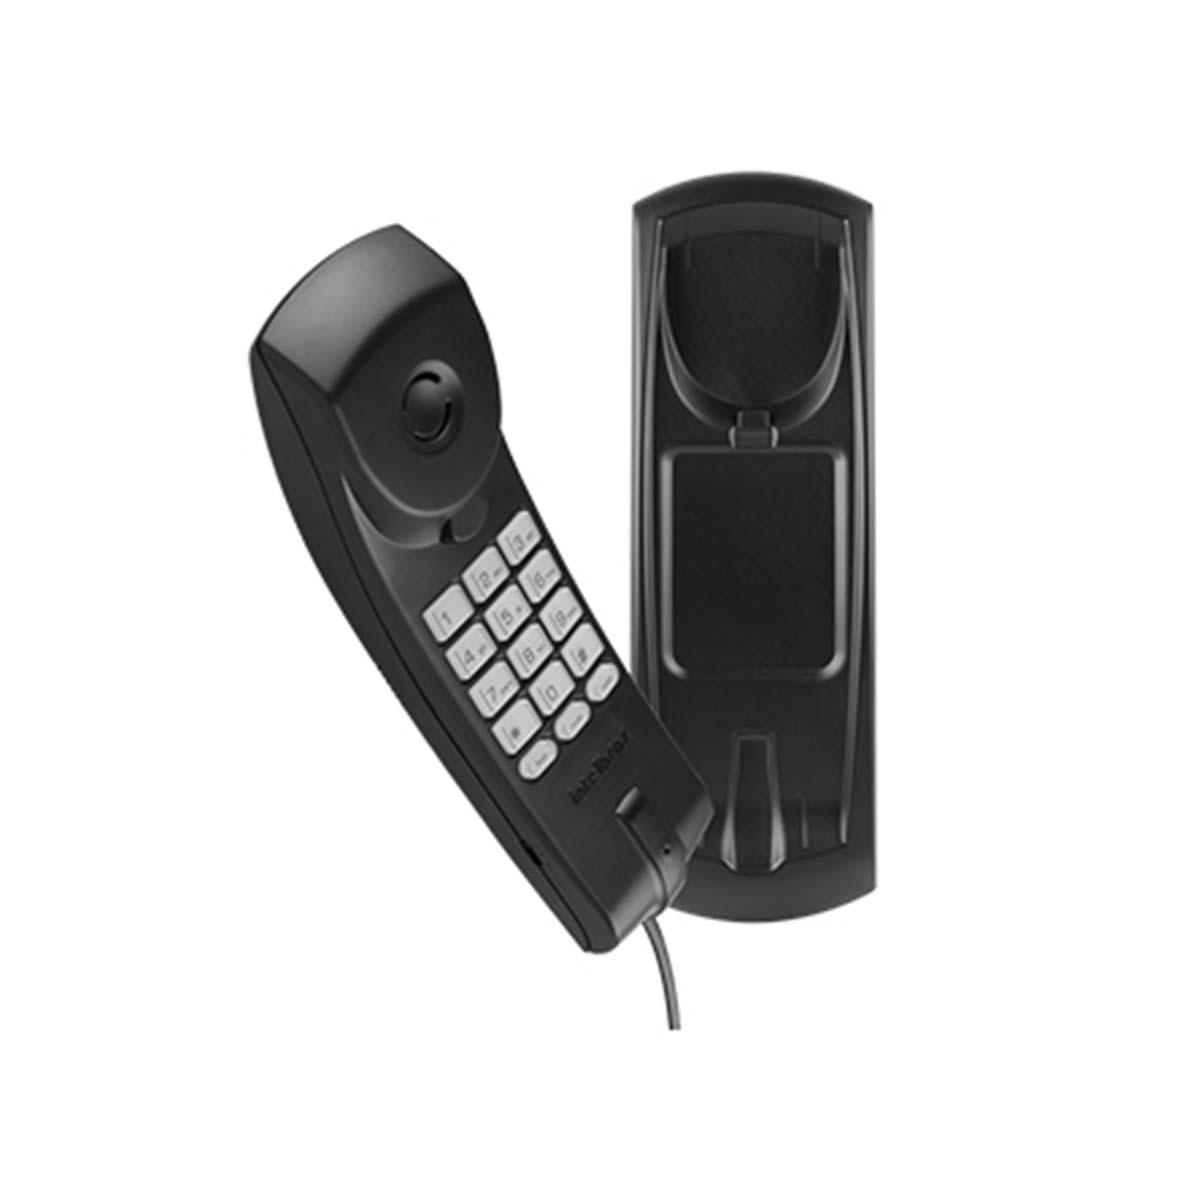 Kit 10 Telefone Intelbras Com Fio Gondola Tc20 Preto